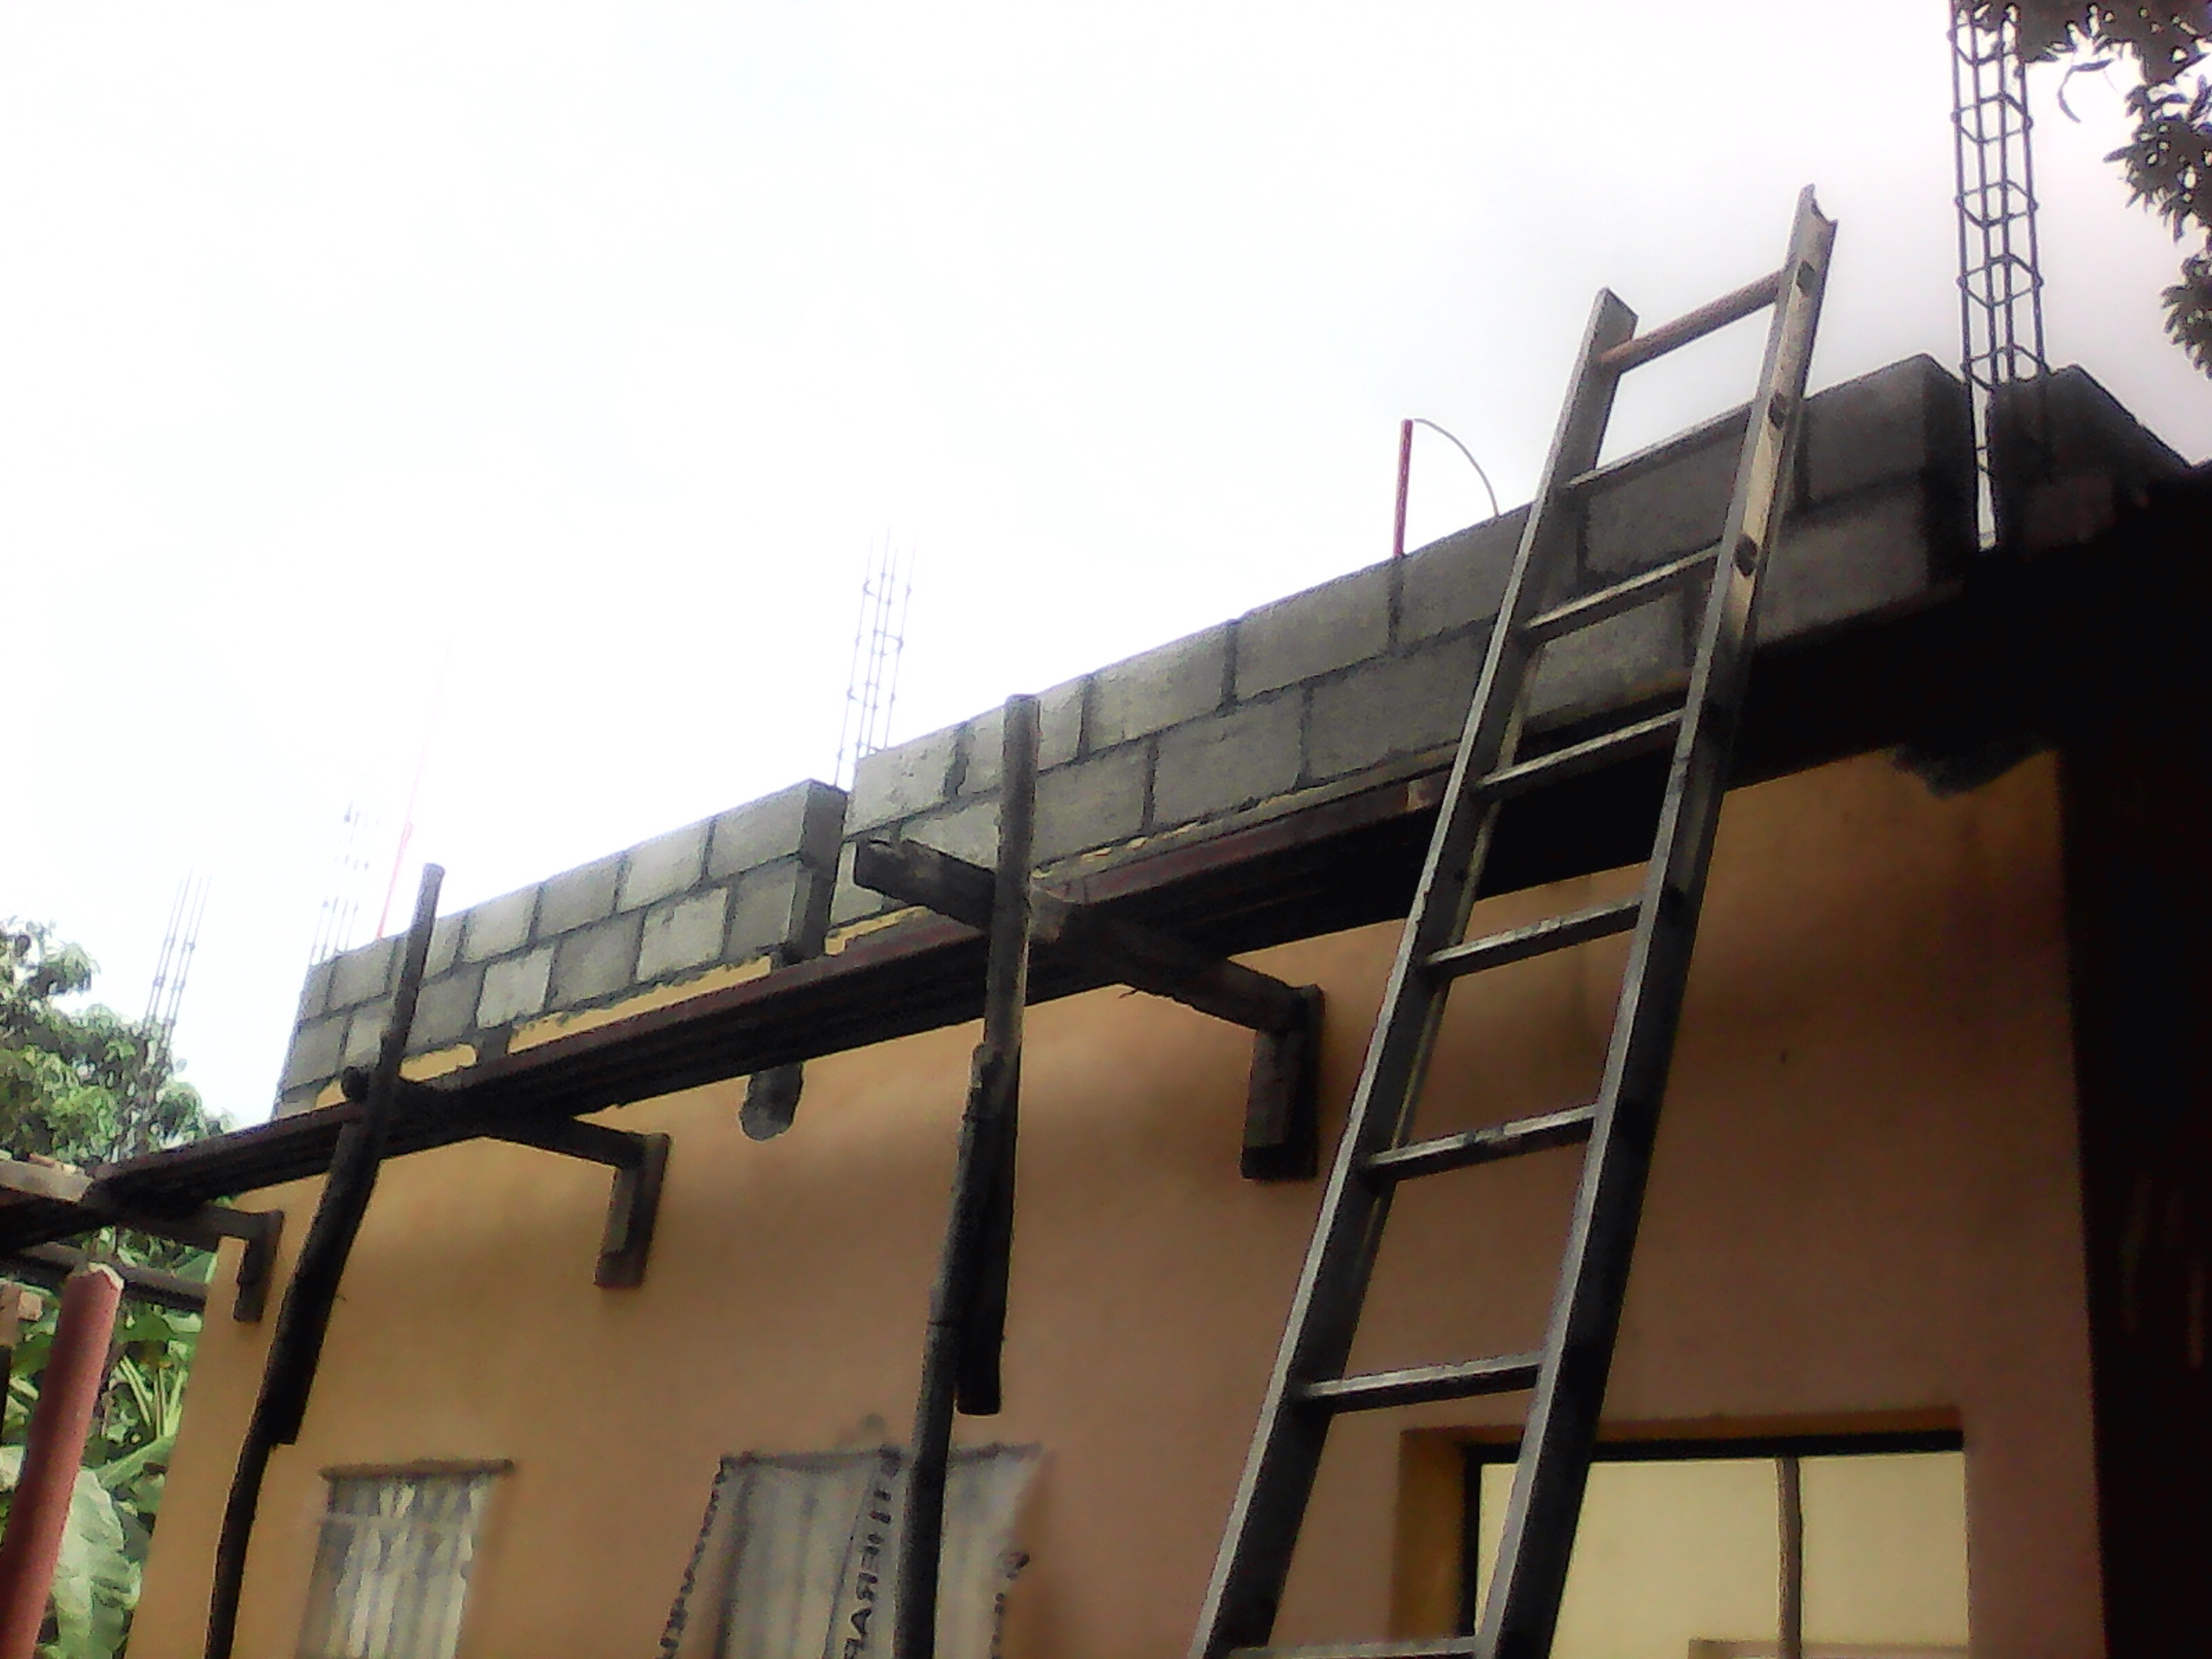 Roof_3.JPG